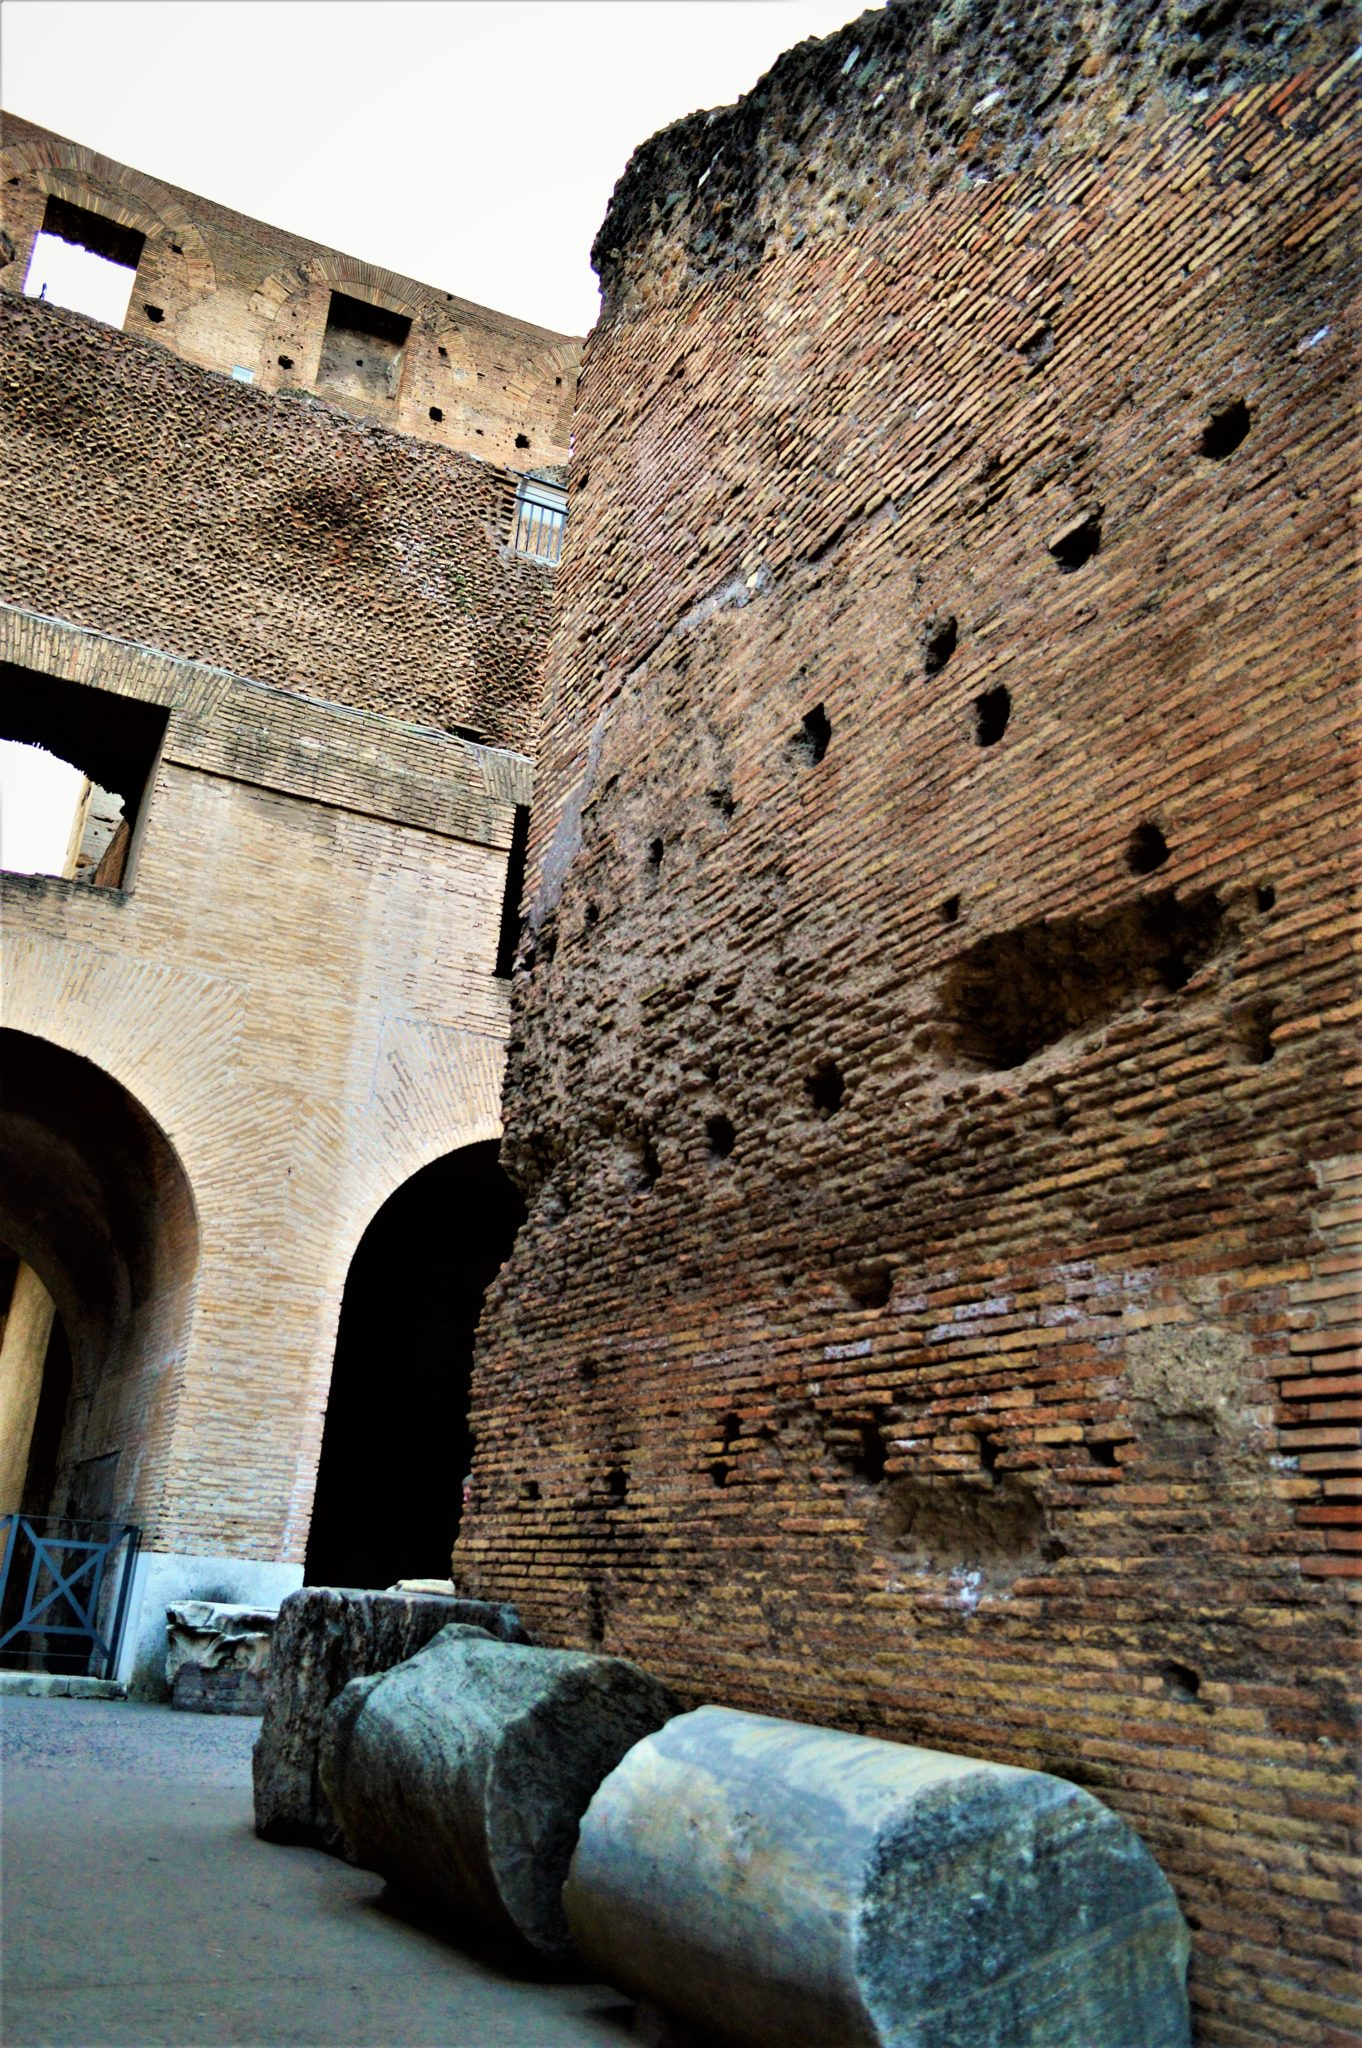 Column pieces in the Roman Colosseum, Rome, Italy